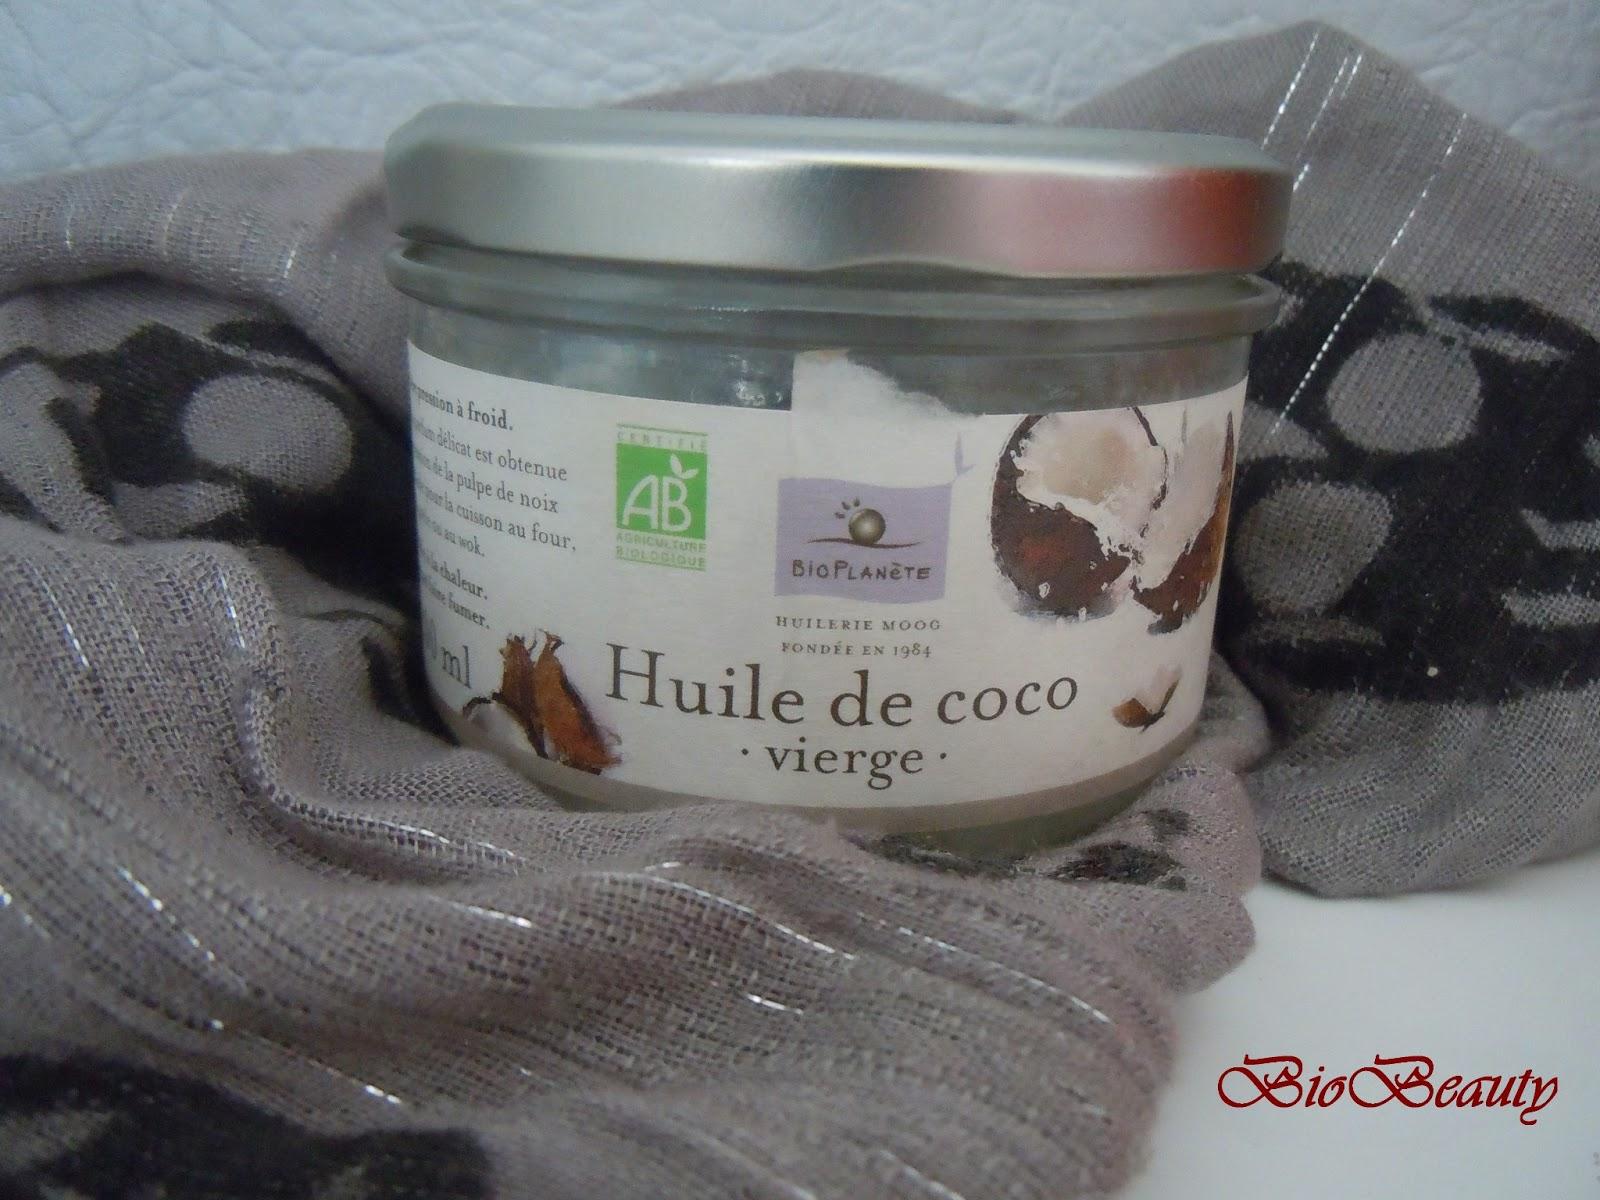 biobeauty indispensable huile de coco. Black Bedroom Furniture Sets. Home Design Ideas